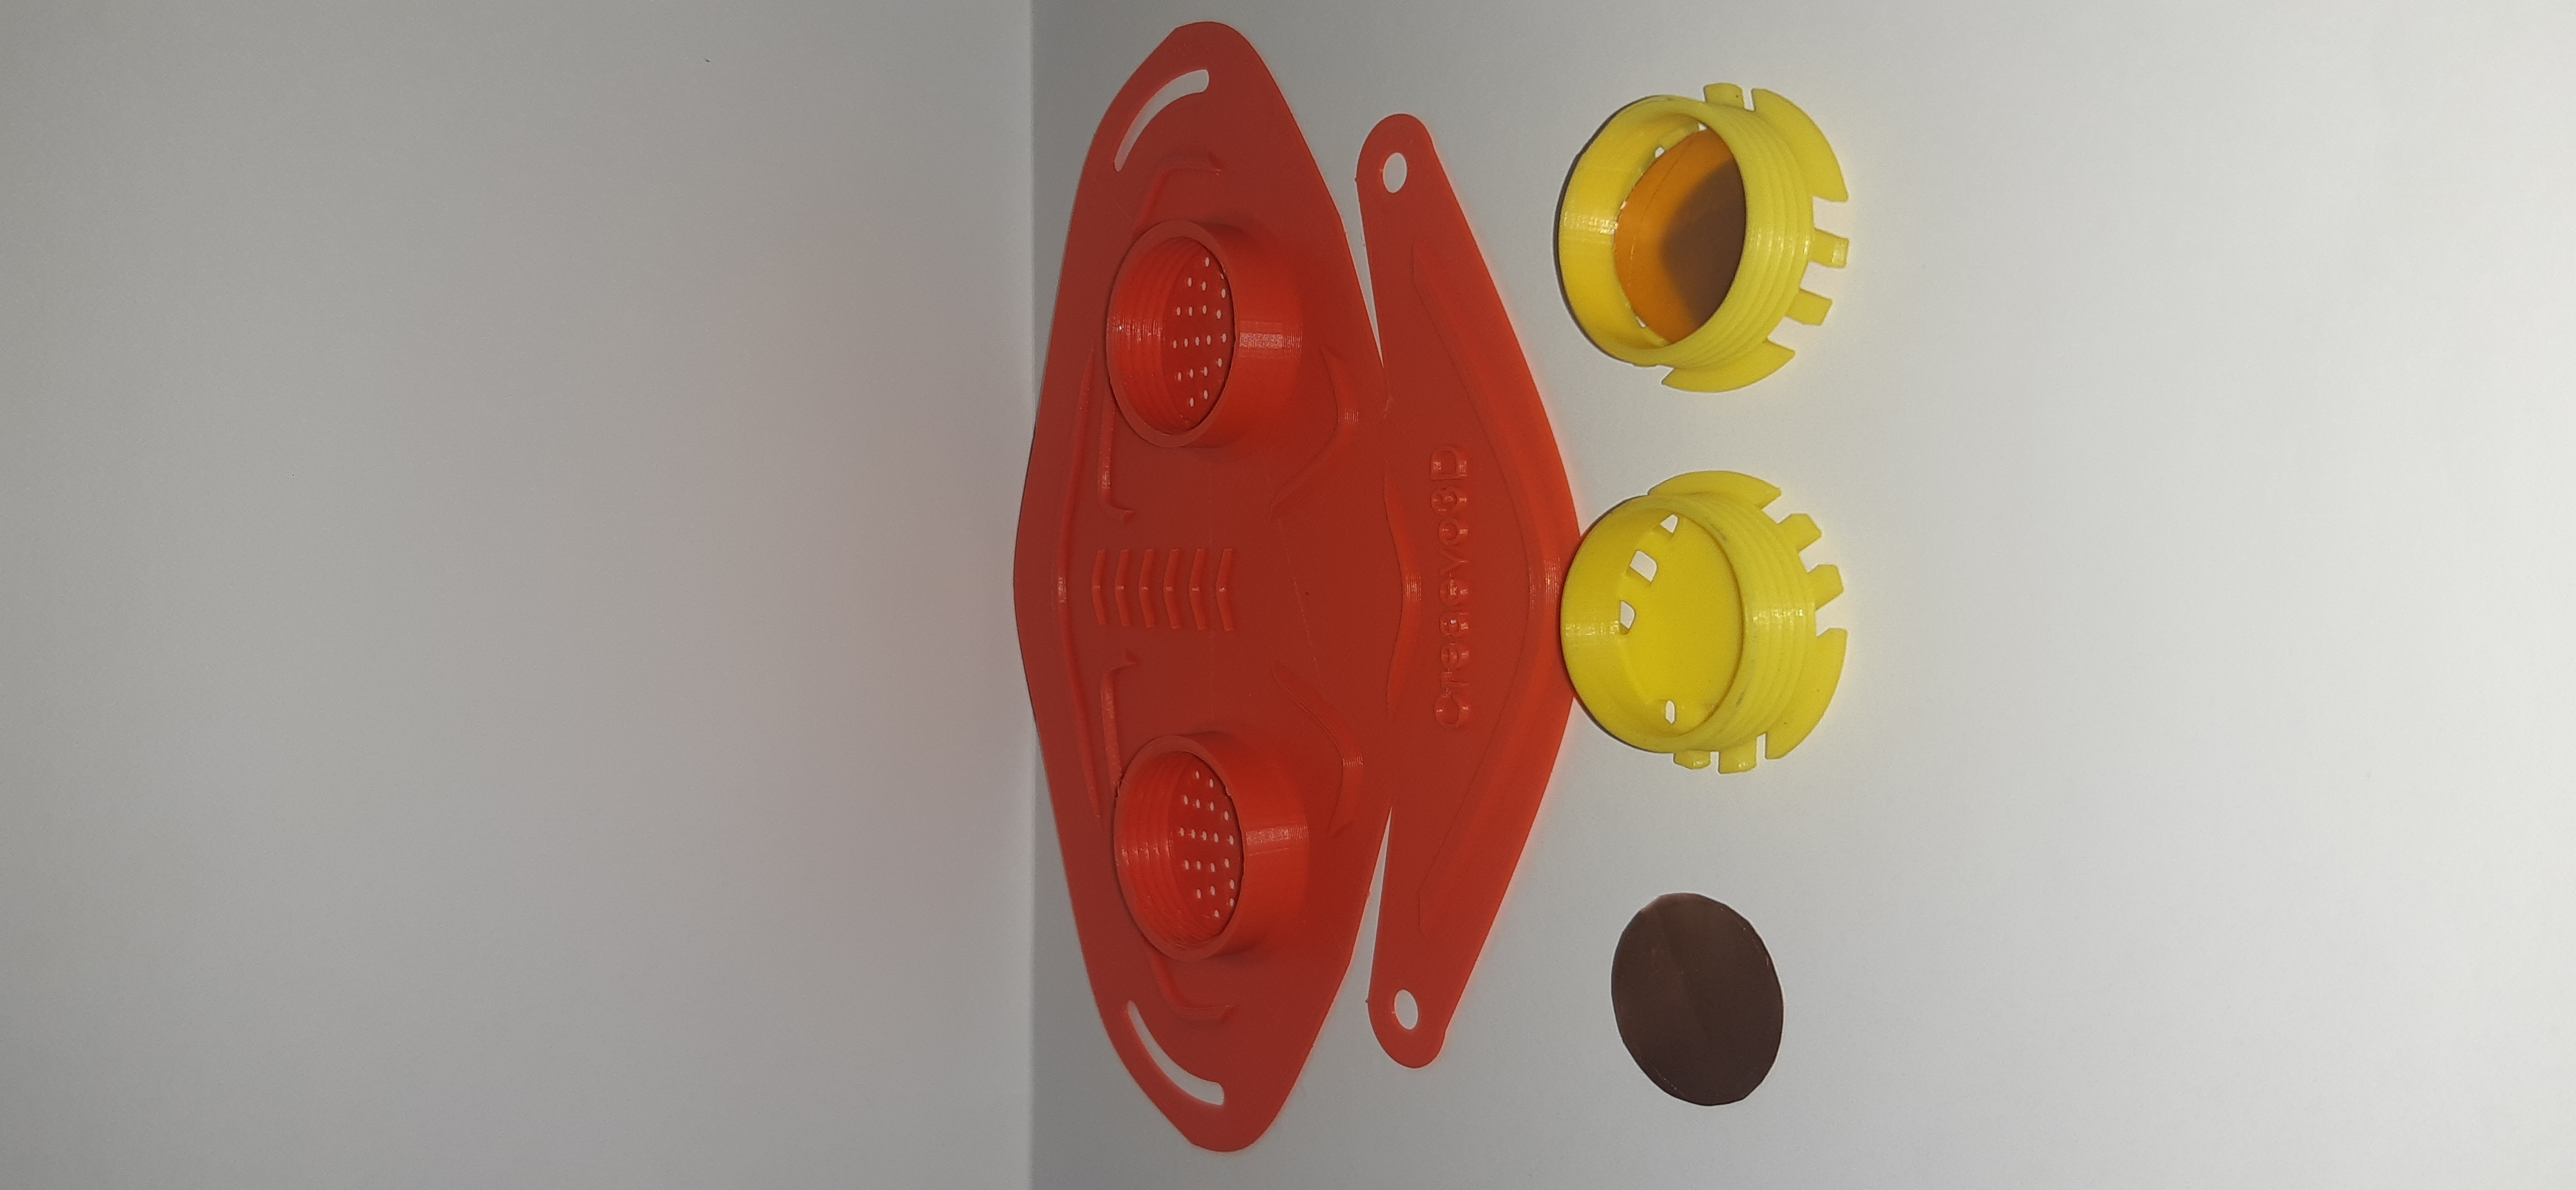 20200323_095328.jpg Download free STL file mask covid-19 • Model to 3D print, Creaevo3D